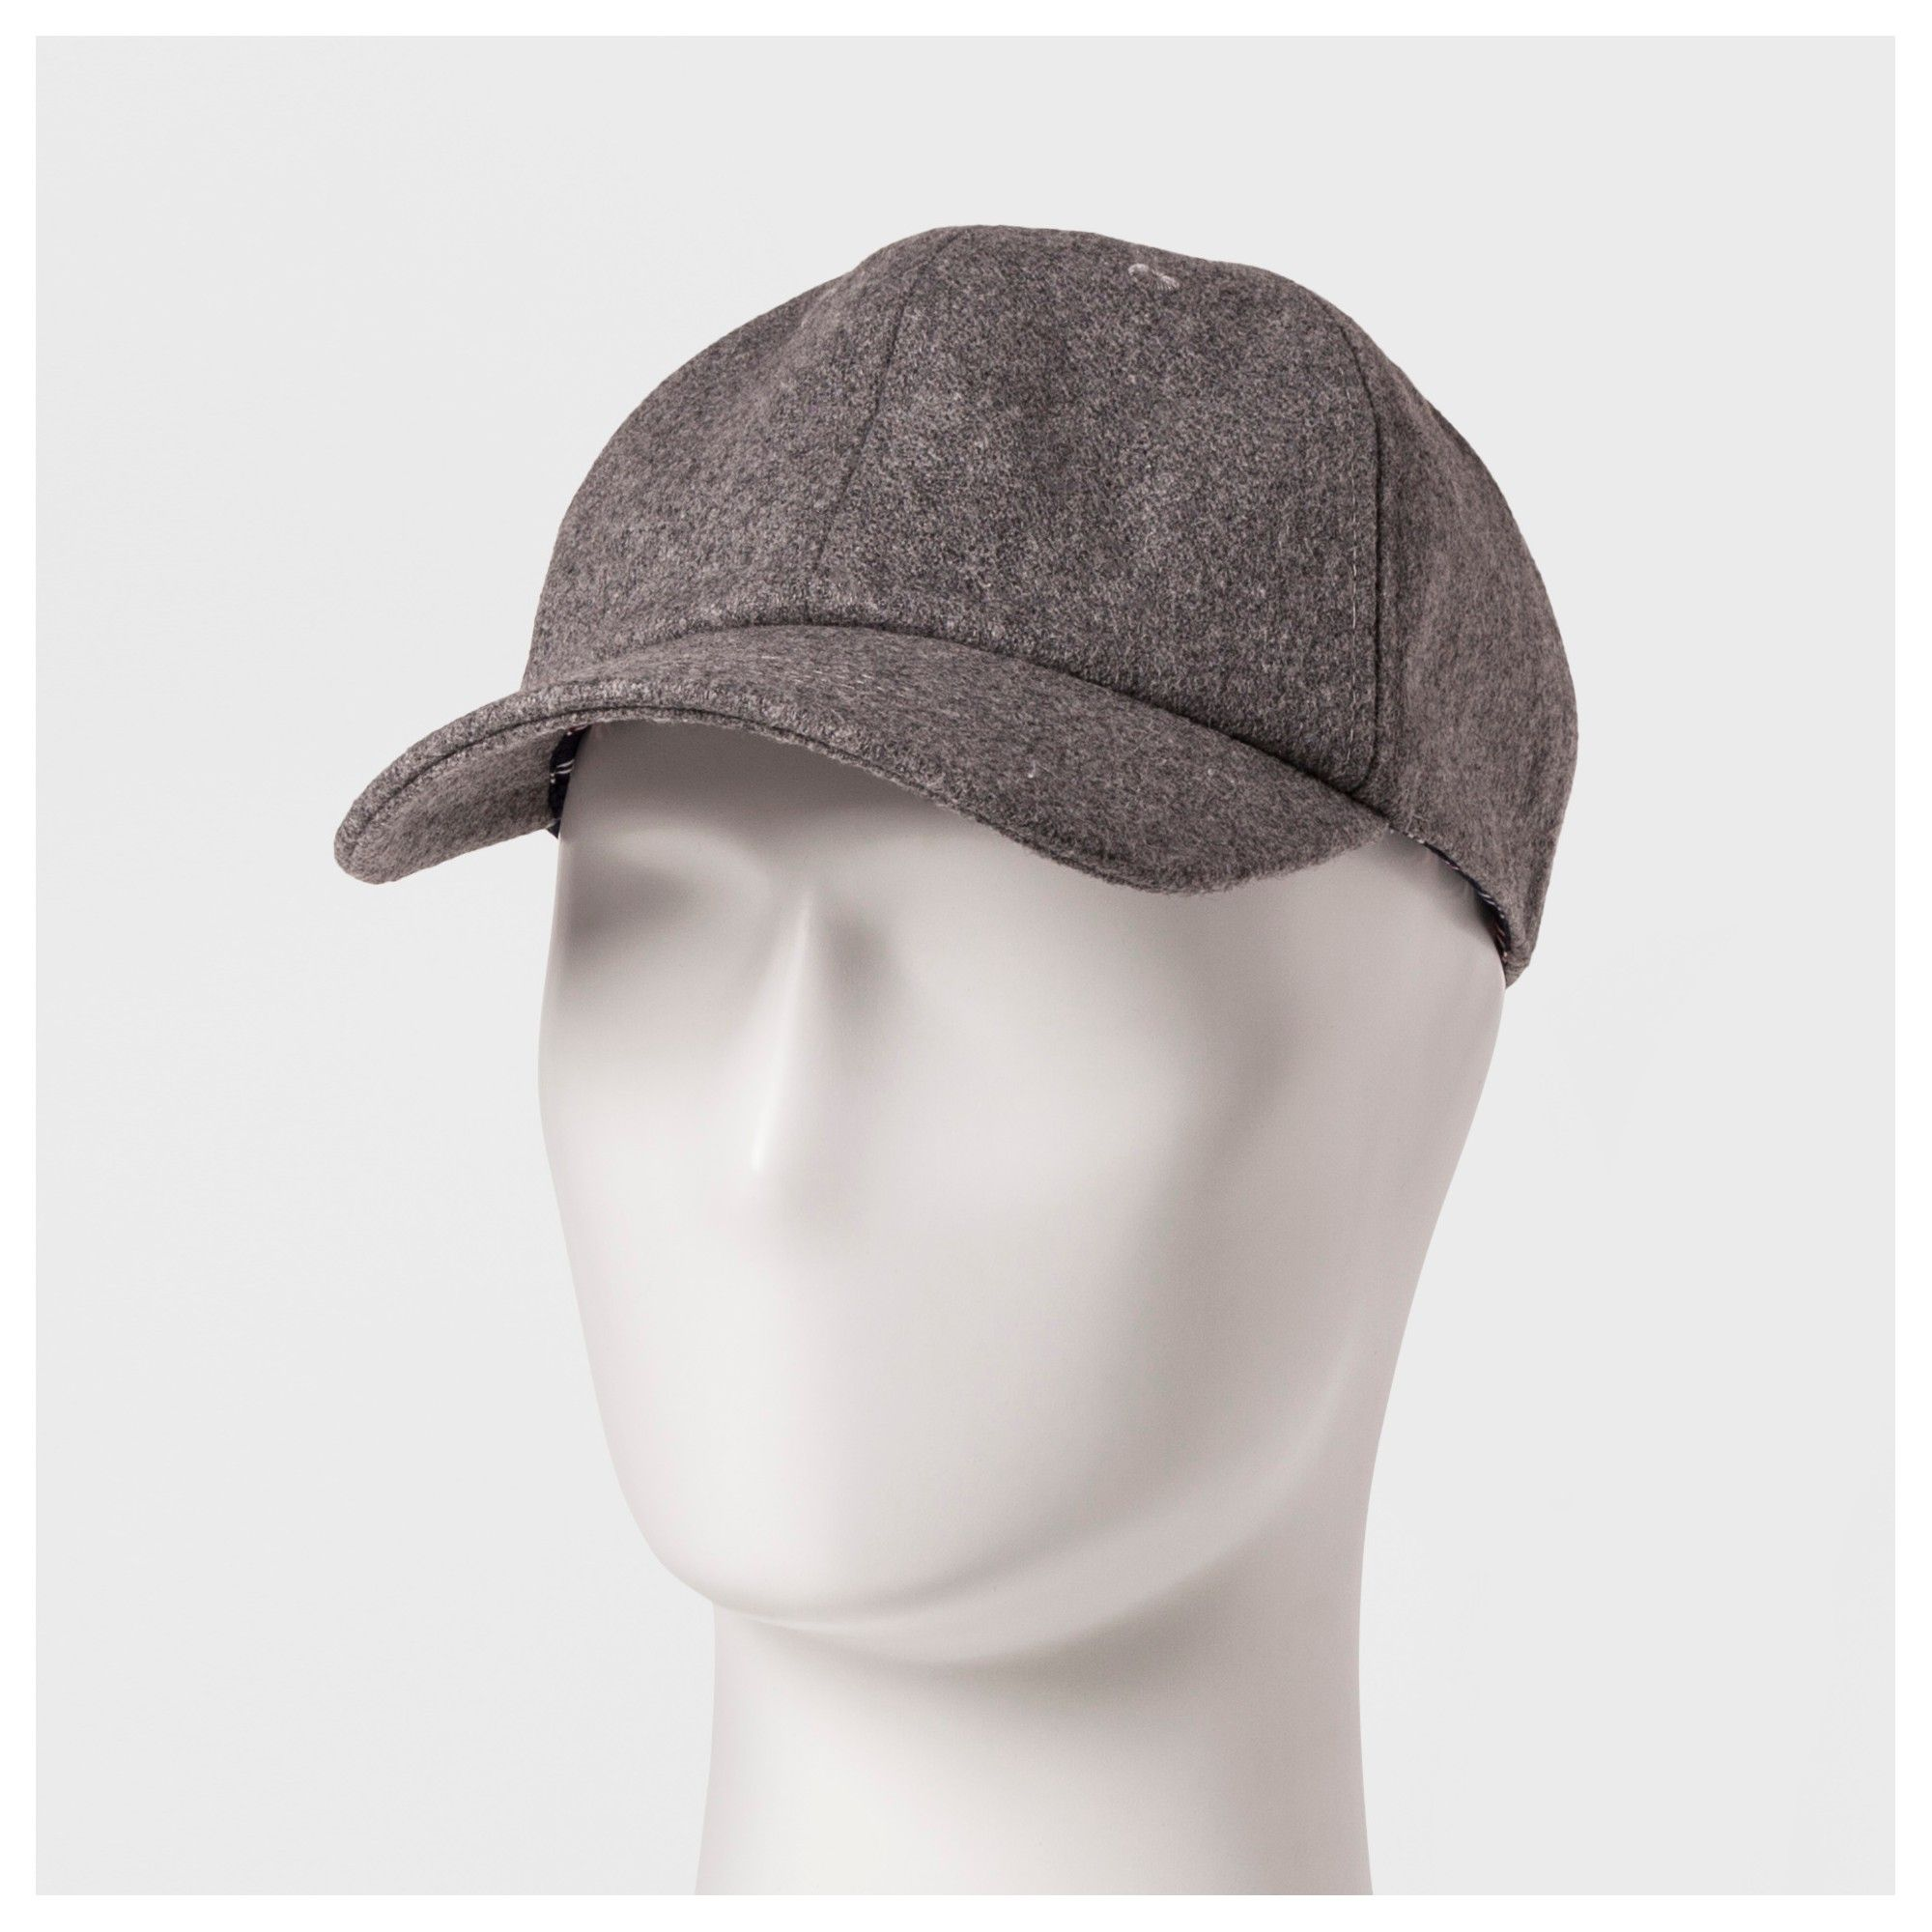 52b232f7d3c59 Men s Baseball Hat - Goodfellow   Co Grey One Size